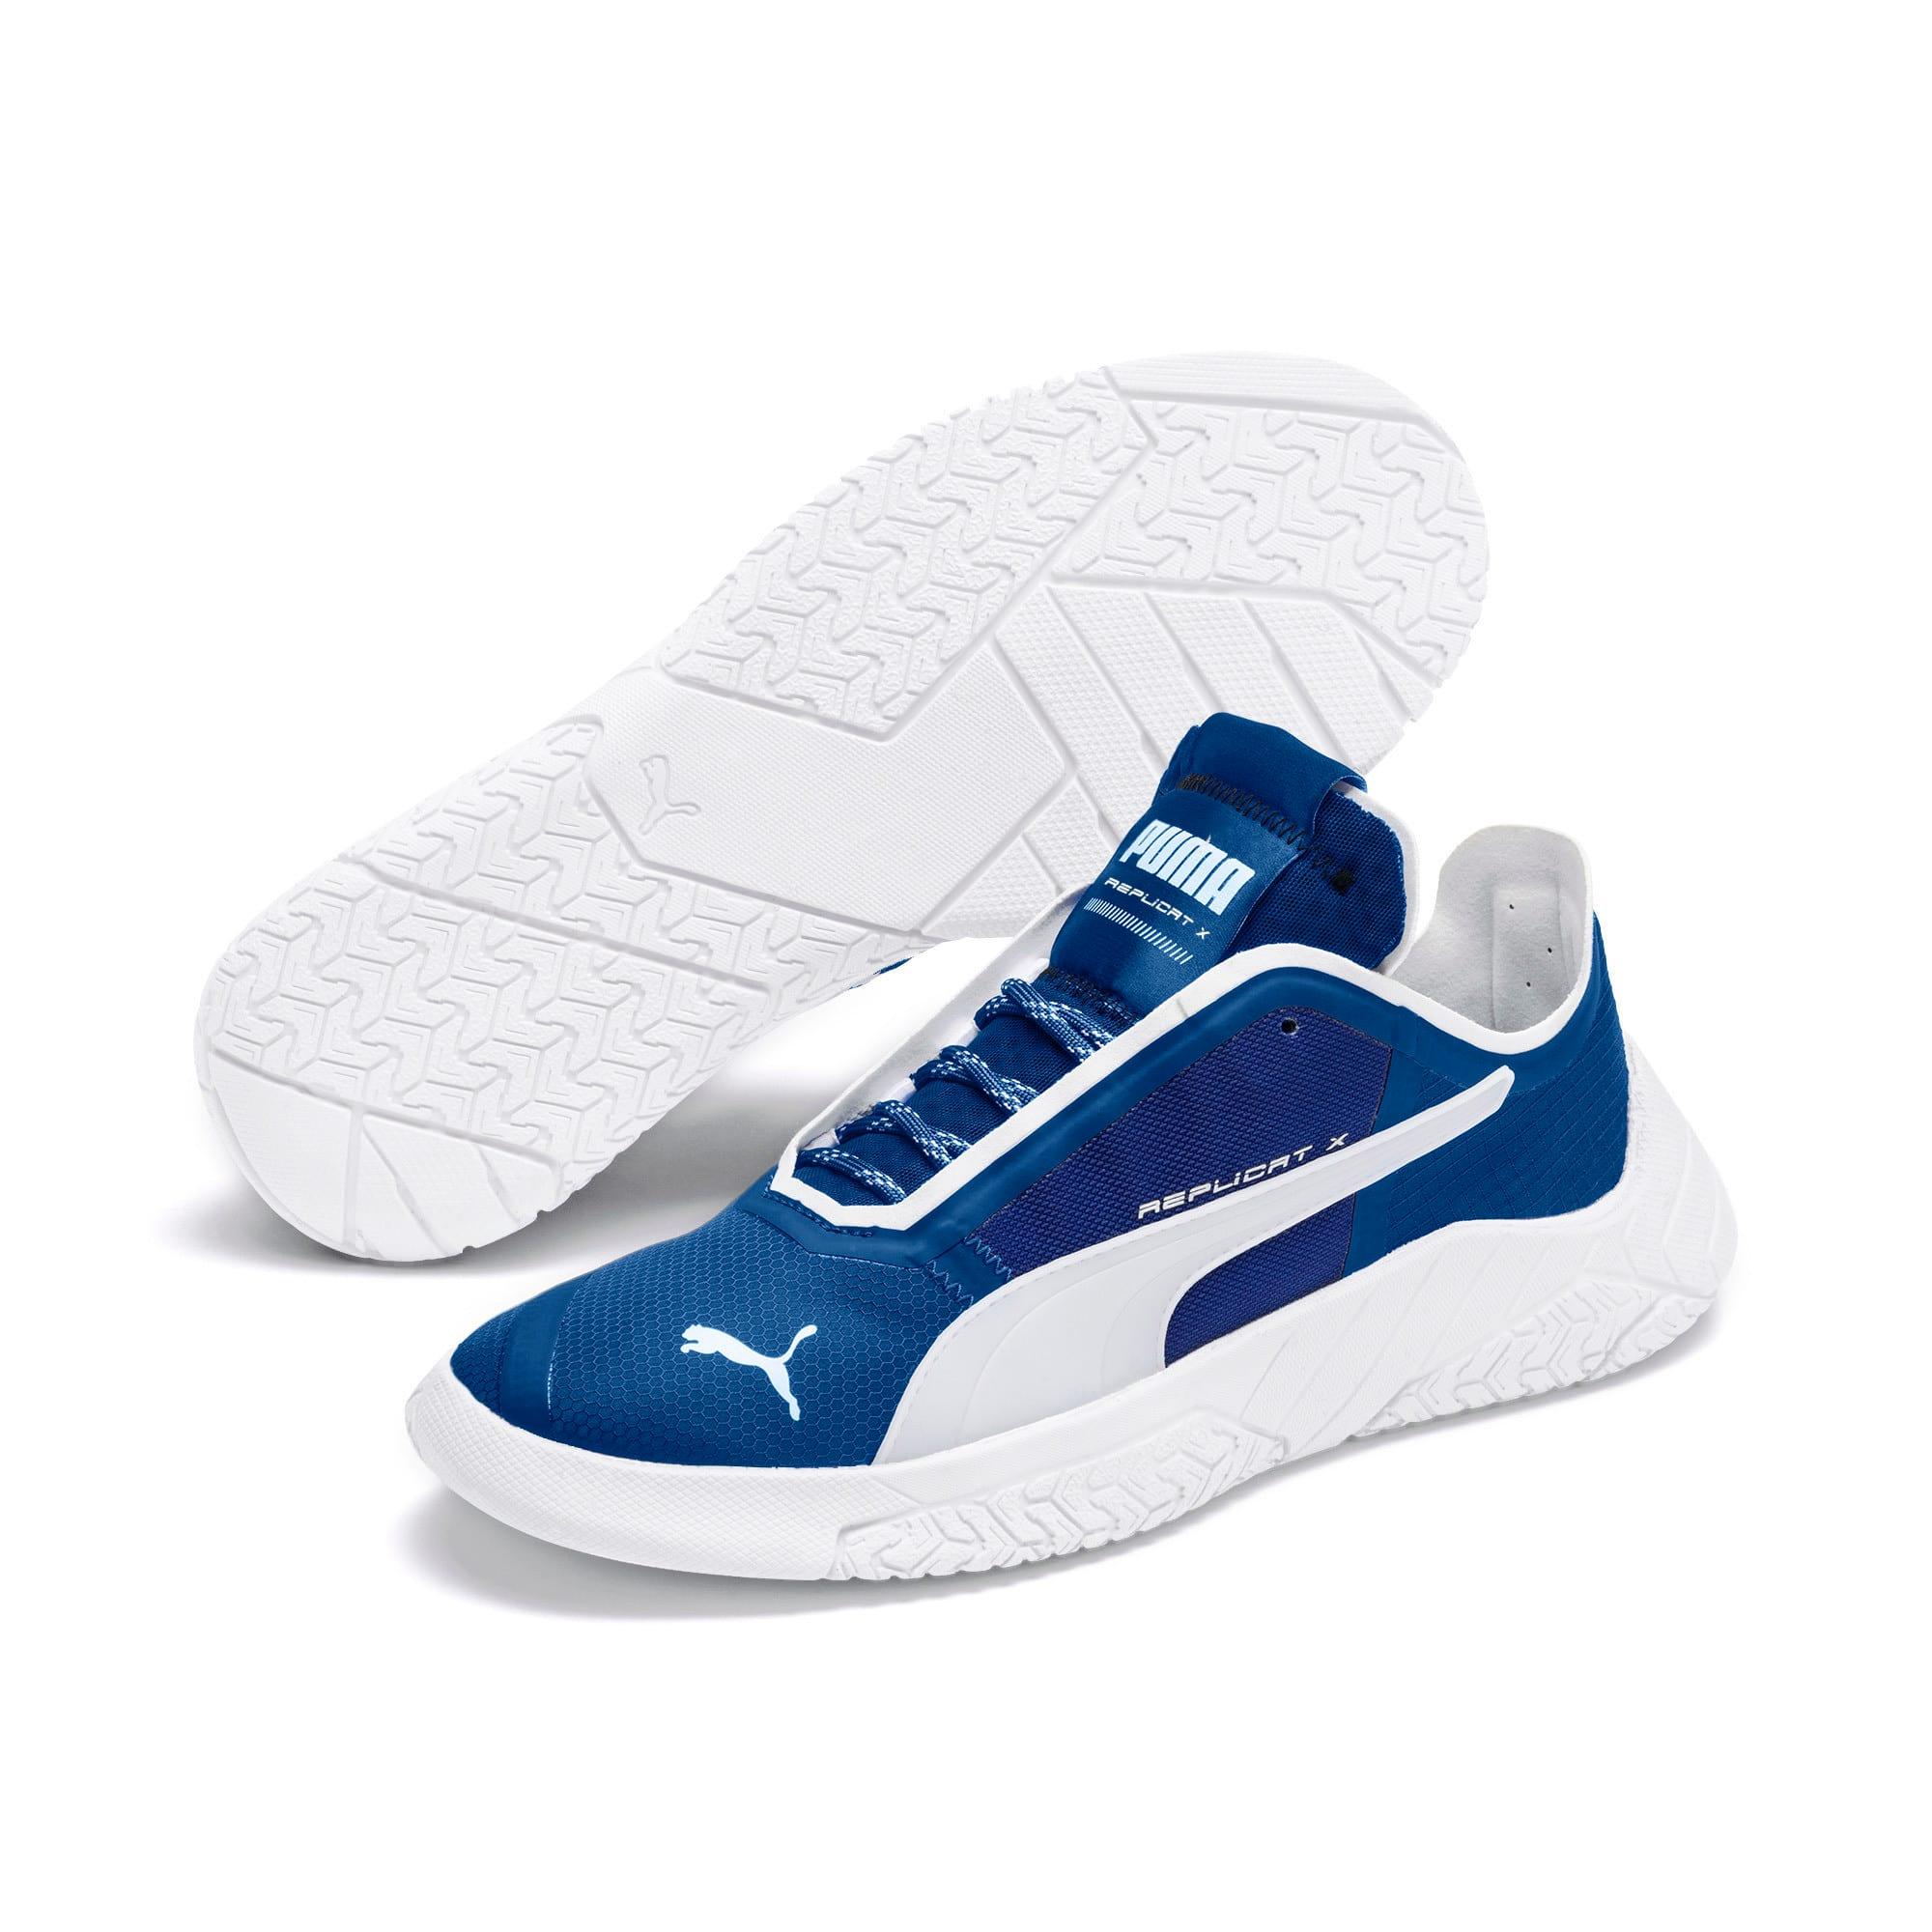 Thumbnail 2 of Replicat-X Circuit Motorsport Shoes, Galaxy Blue-Puma White, medium